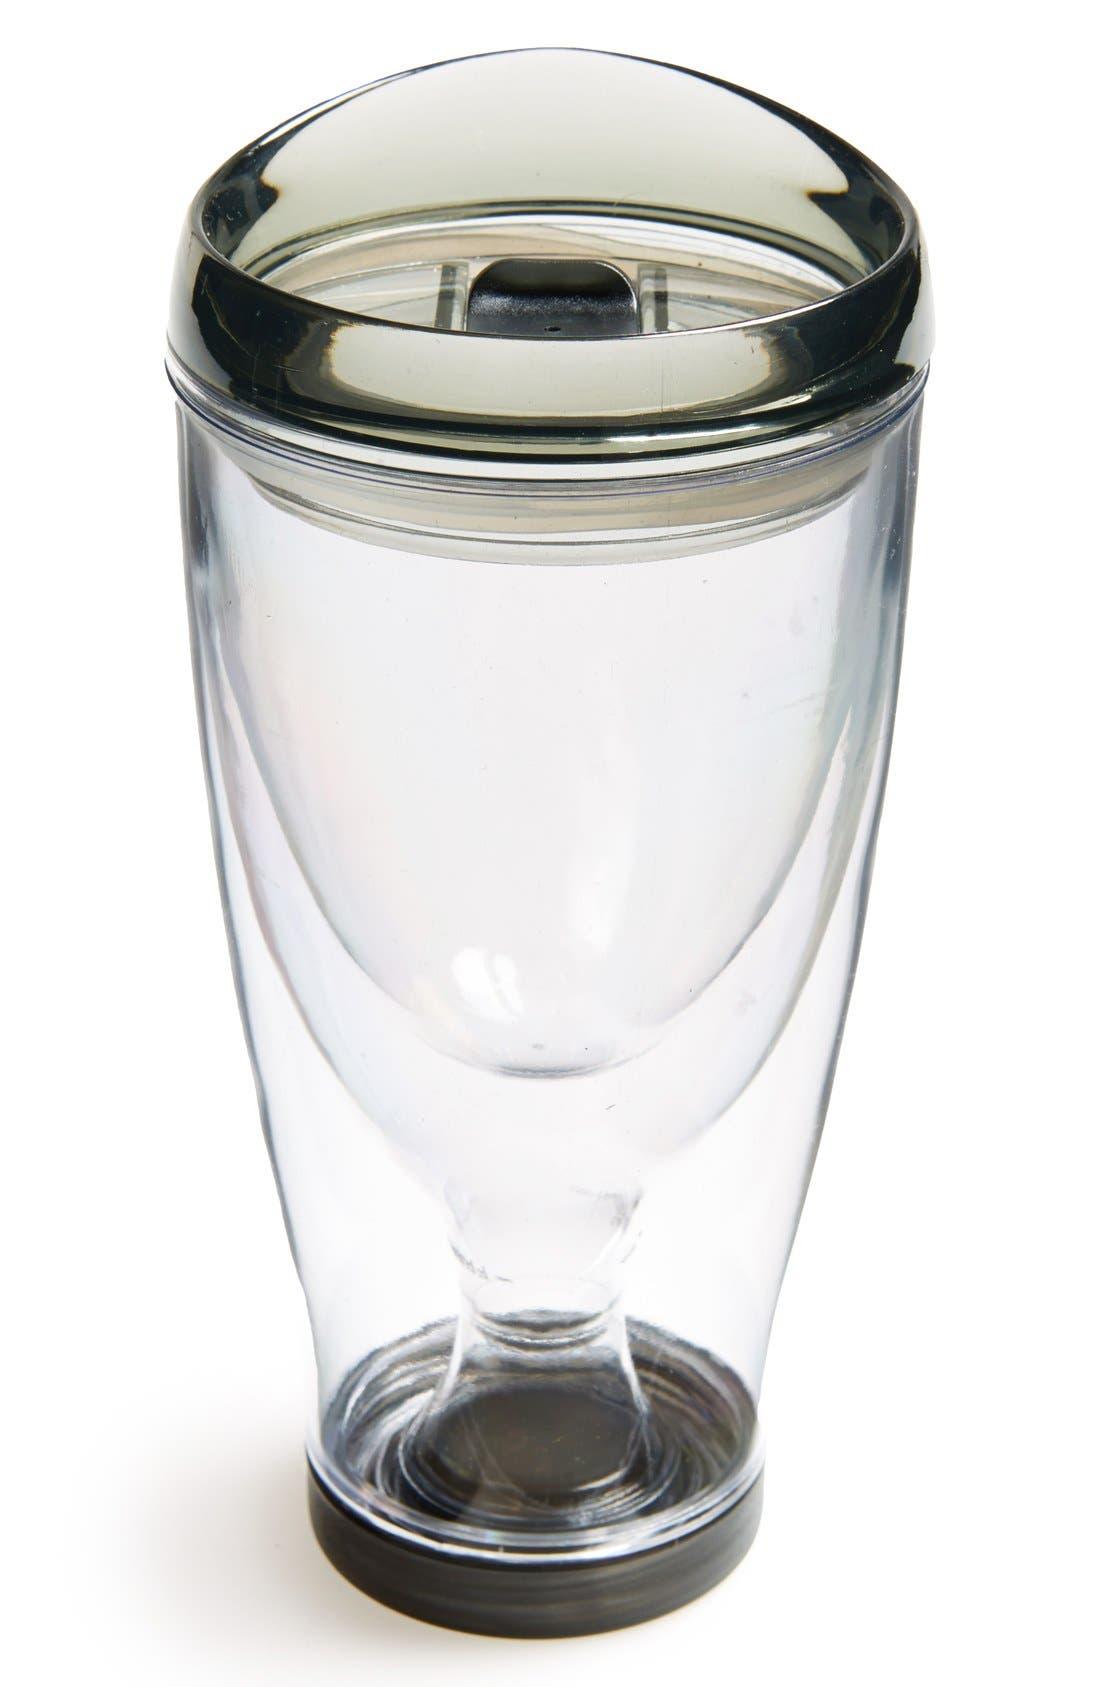 Alternate Image 1 Selected - Ad-N-Art 'Ice Vino 2 Go' Insulated Tumbler